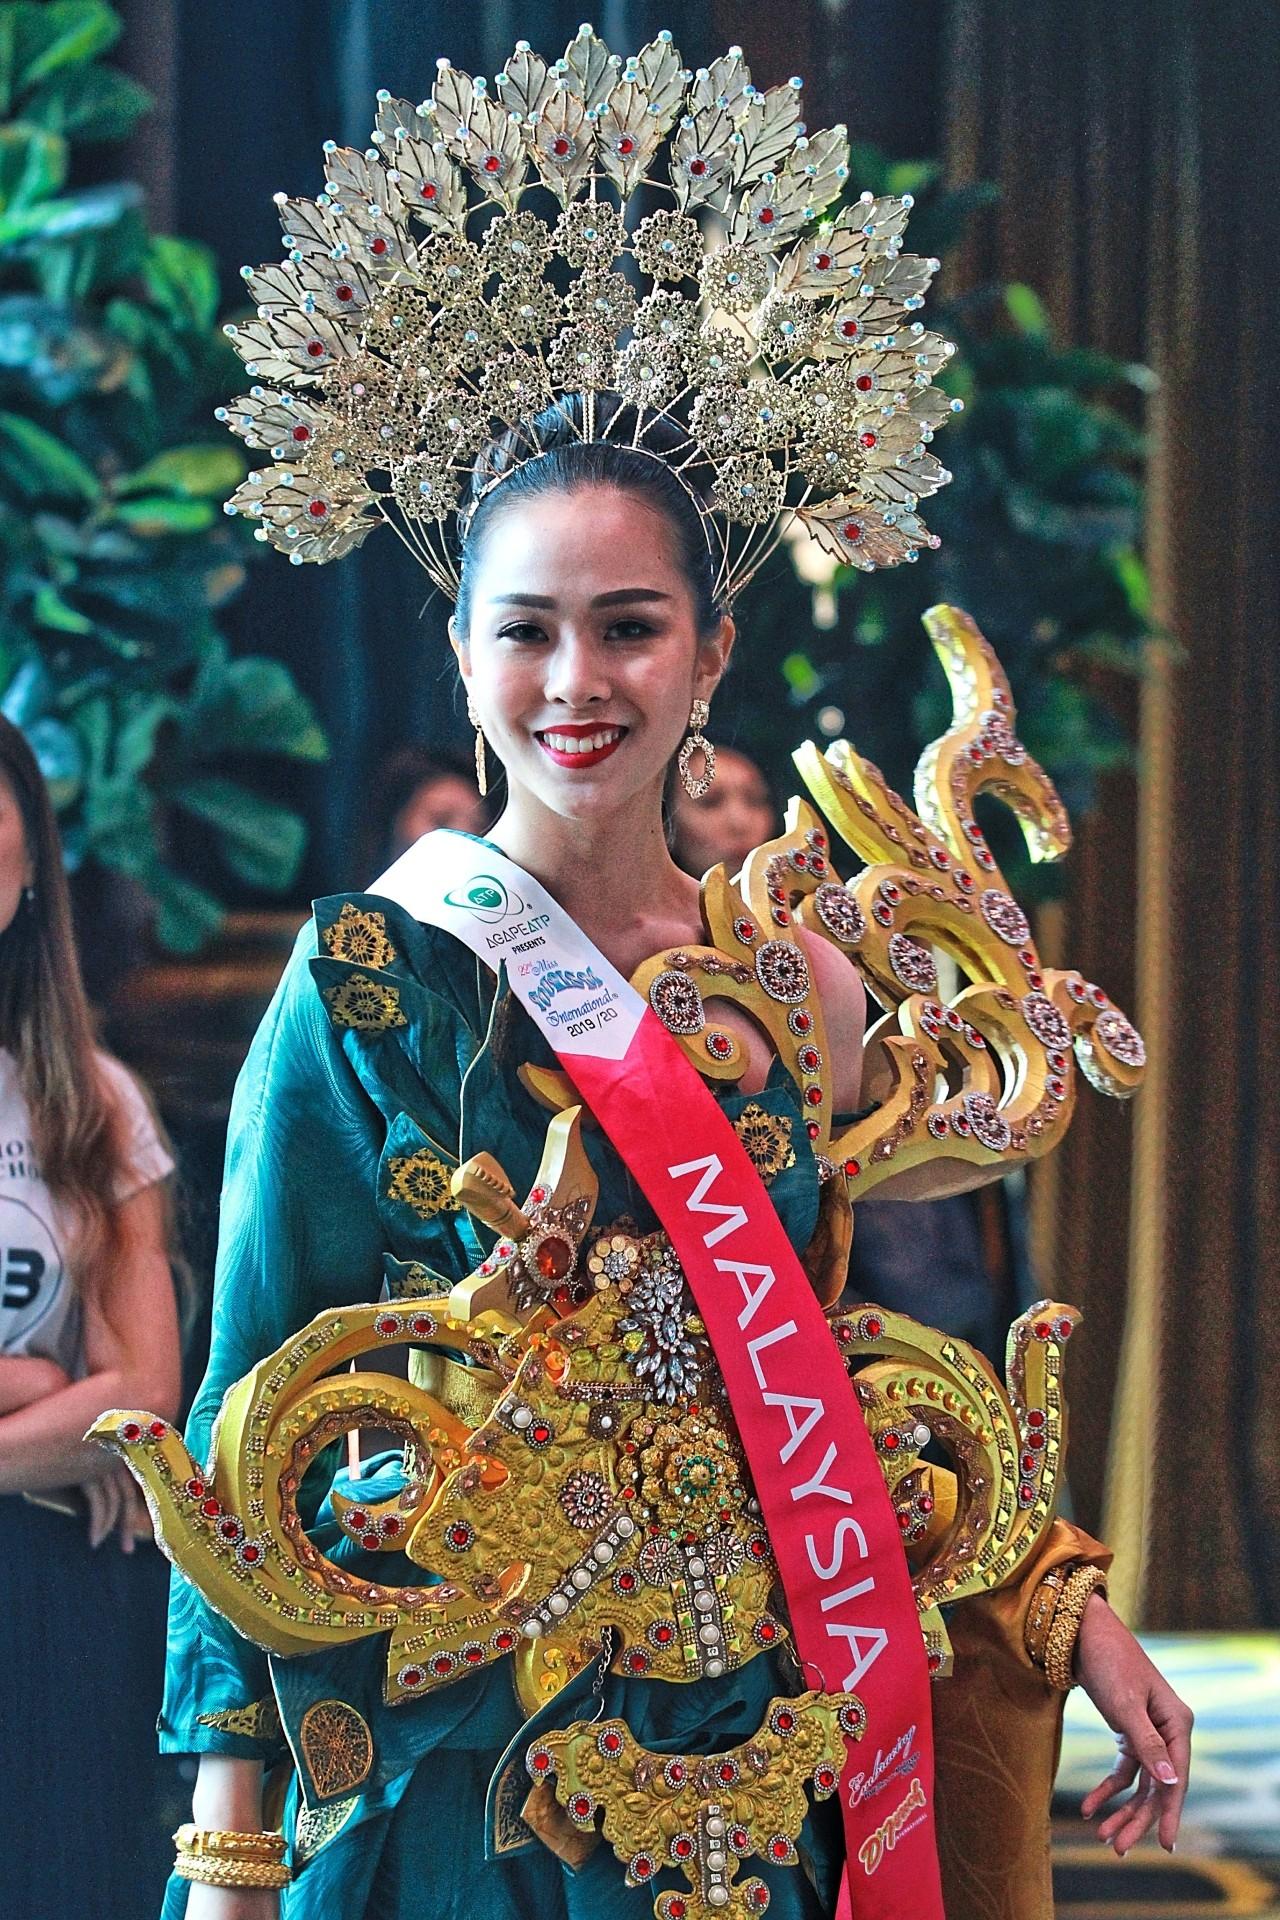 Cheryl Loo Wen Nee representing Malaysia at Miss Tourism International 2019.